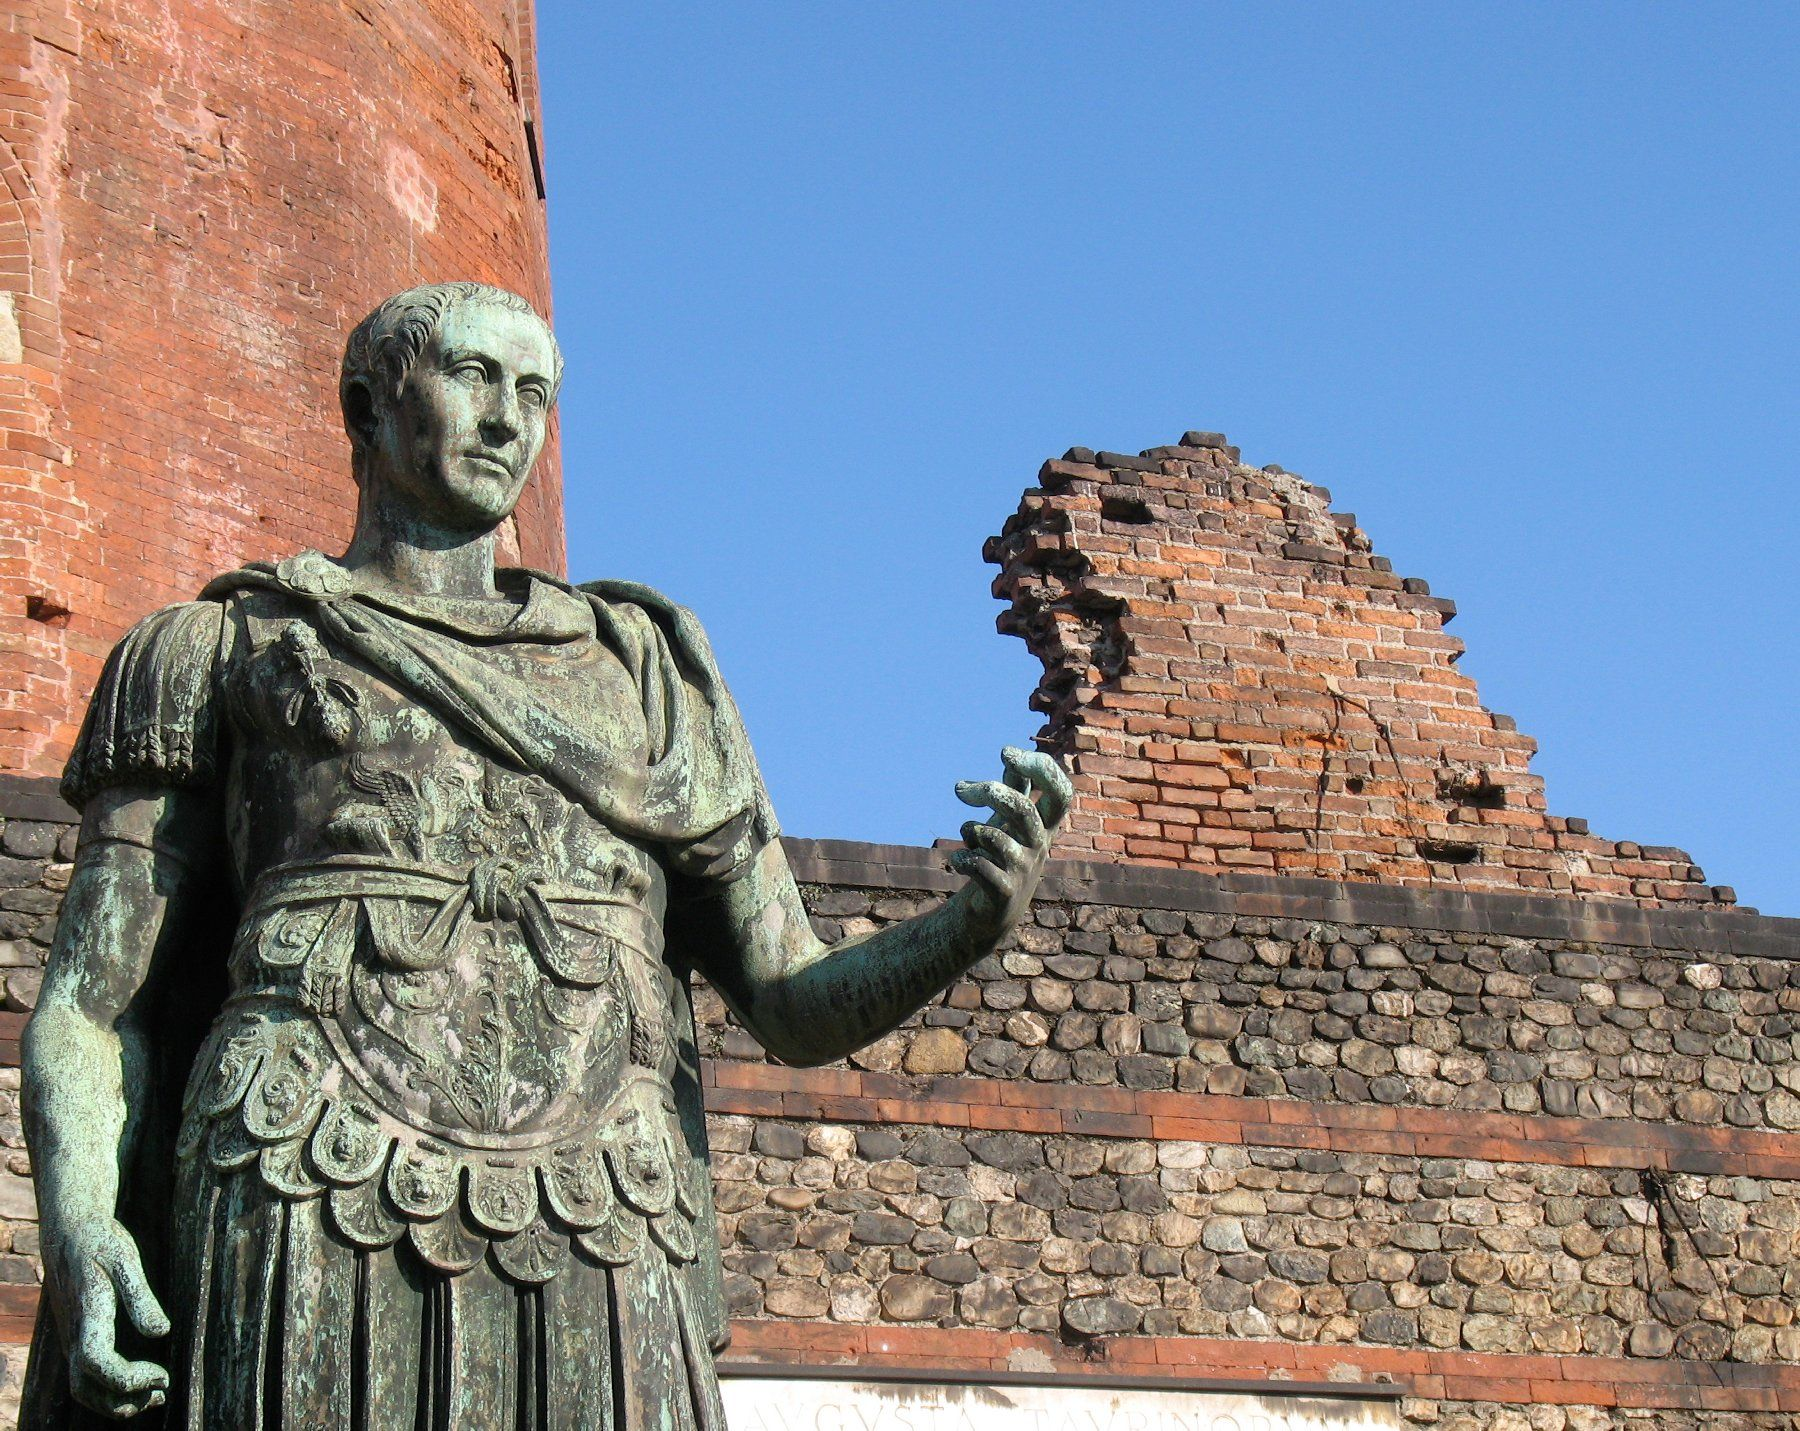 Statue of Julius Caesar at the ancient Porta Palatina in Turin, Italy.